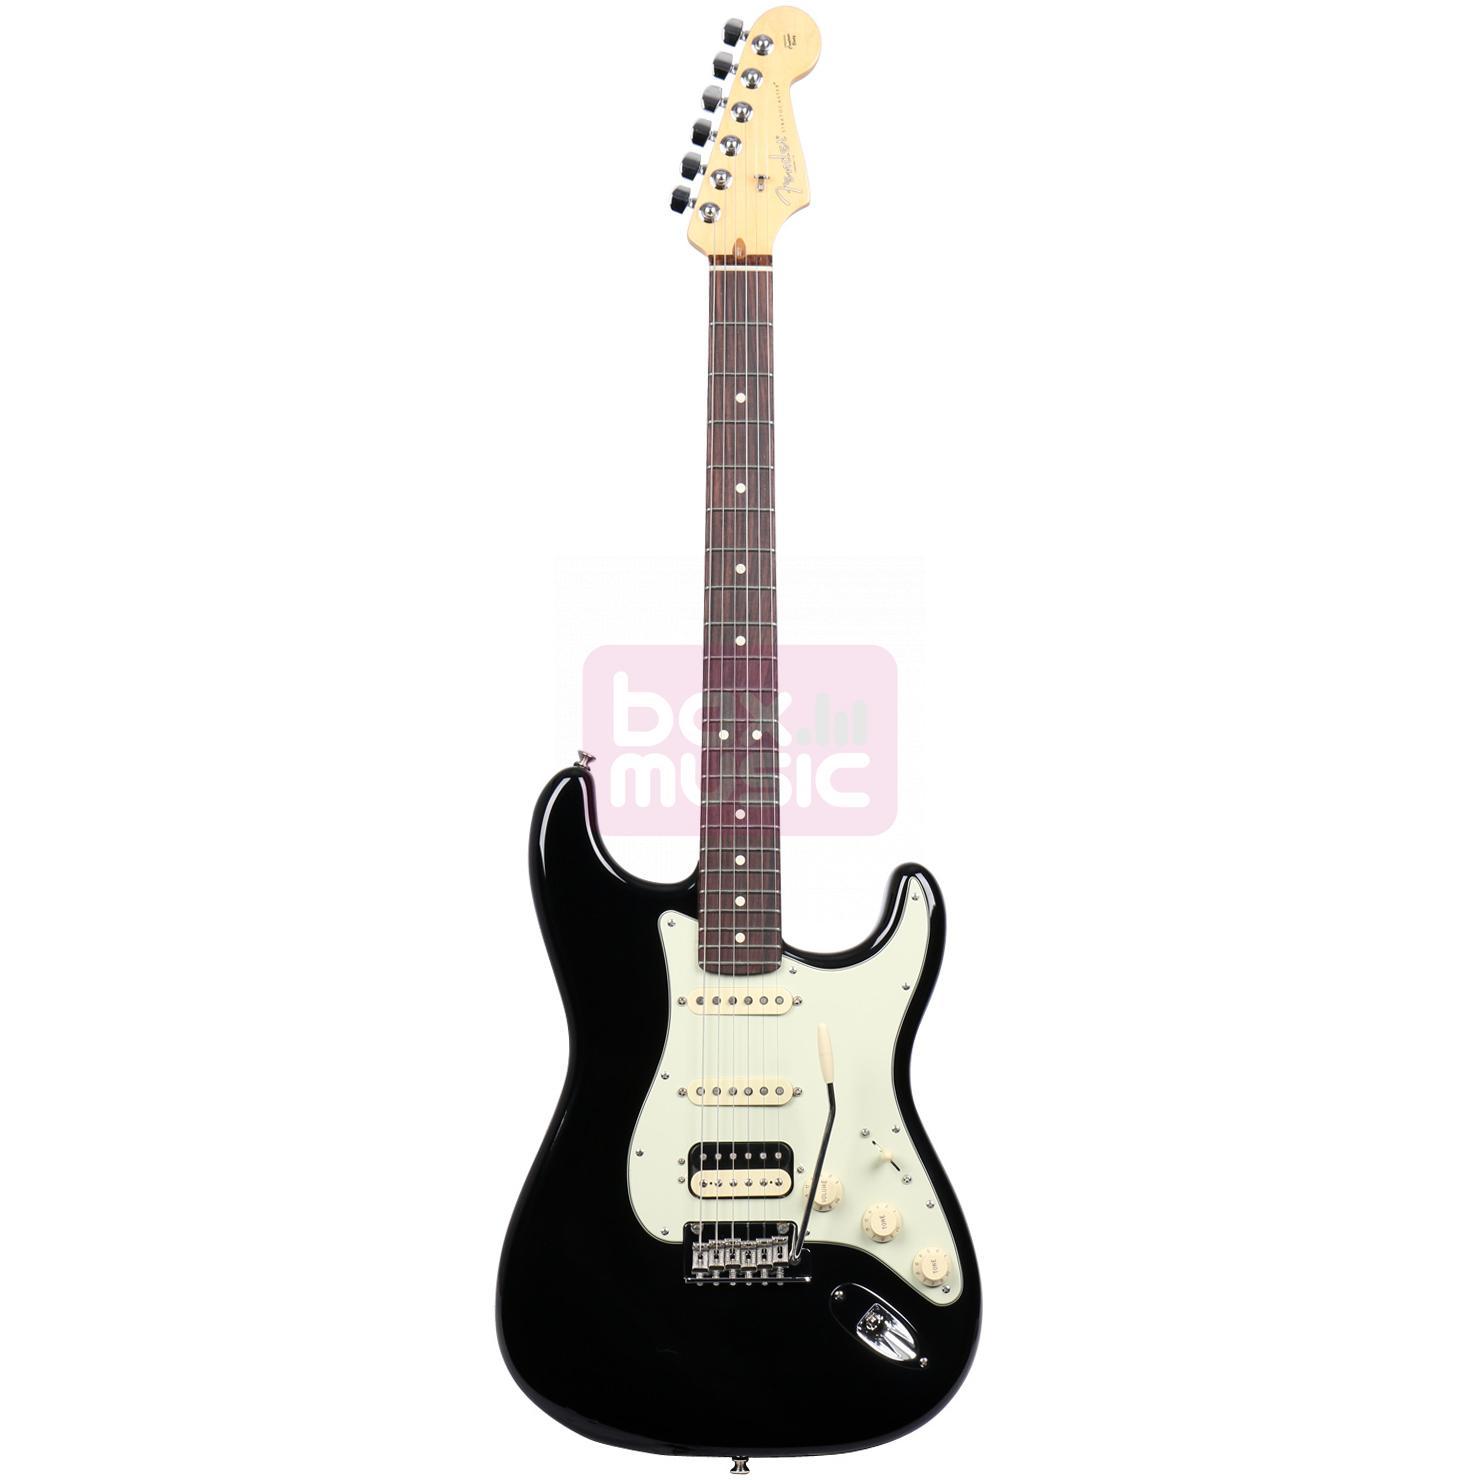 Fender American Pro Stratocaster HSS Shawbucker Black RW